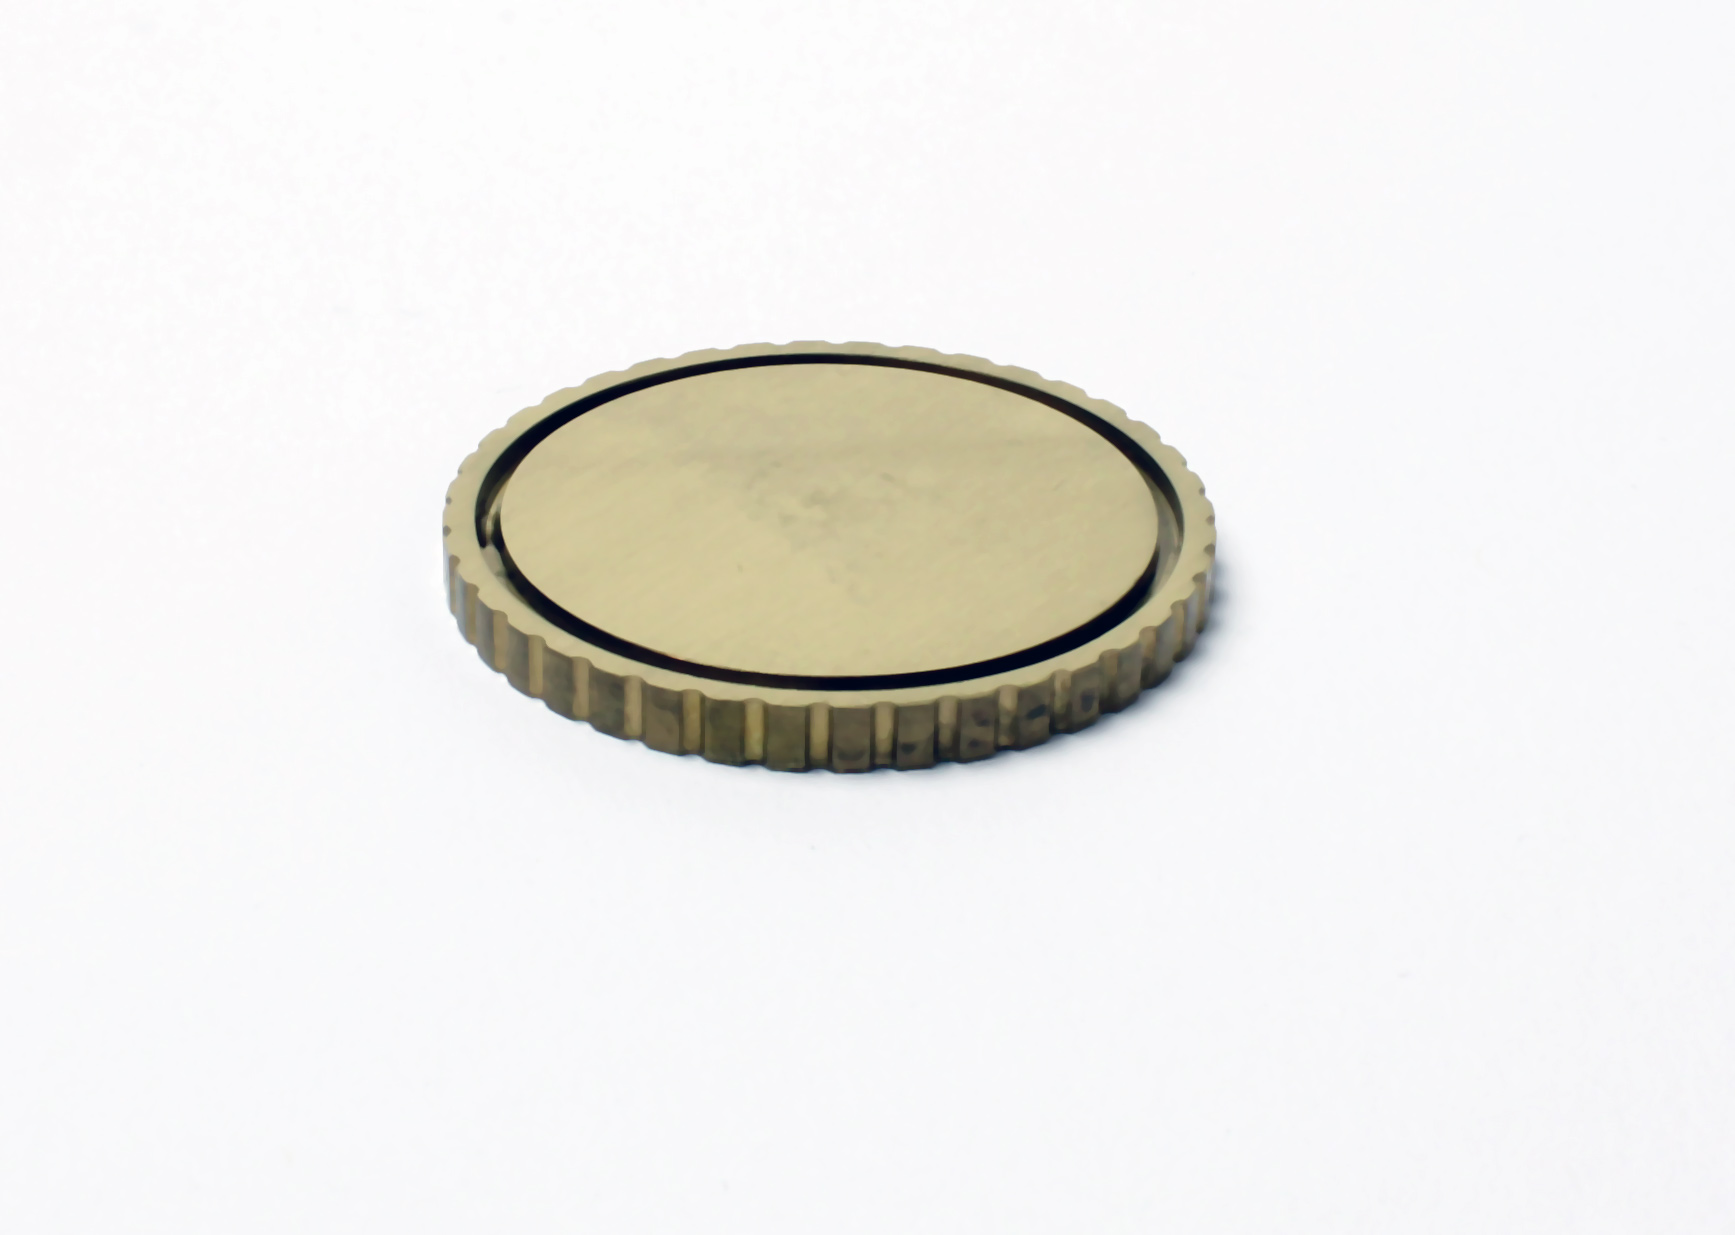 Münze aus Messing 40mm x 3mm